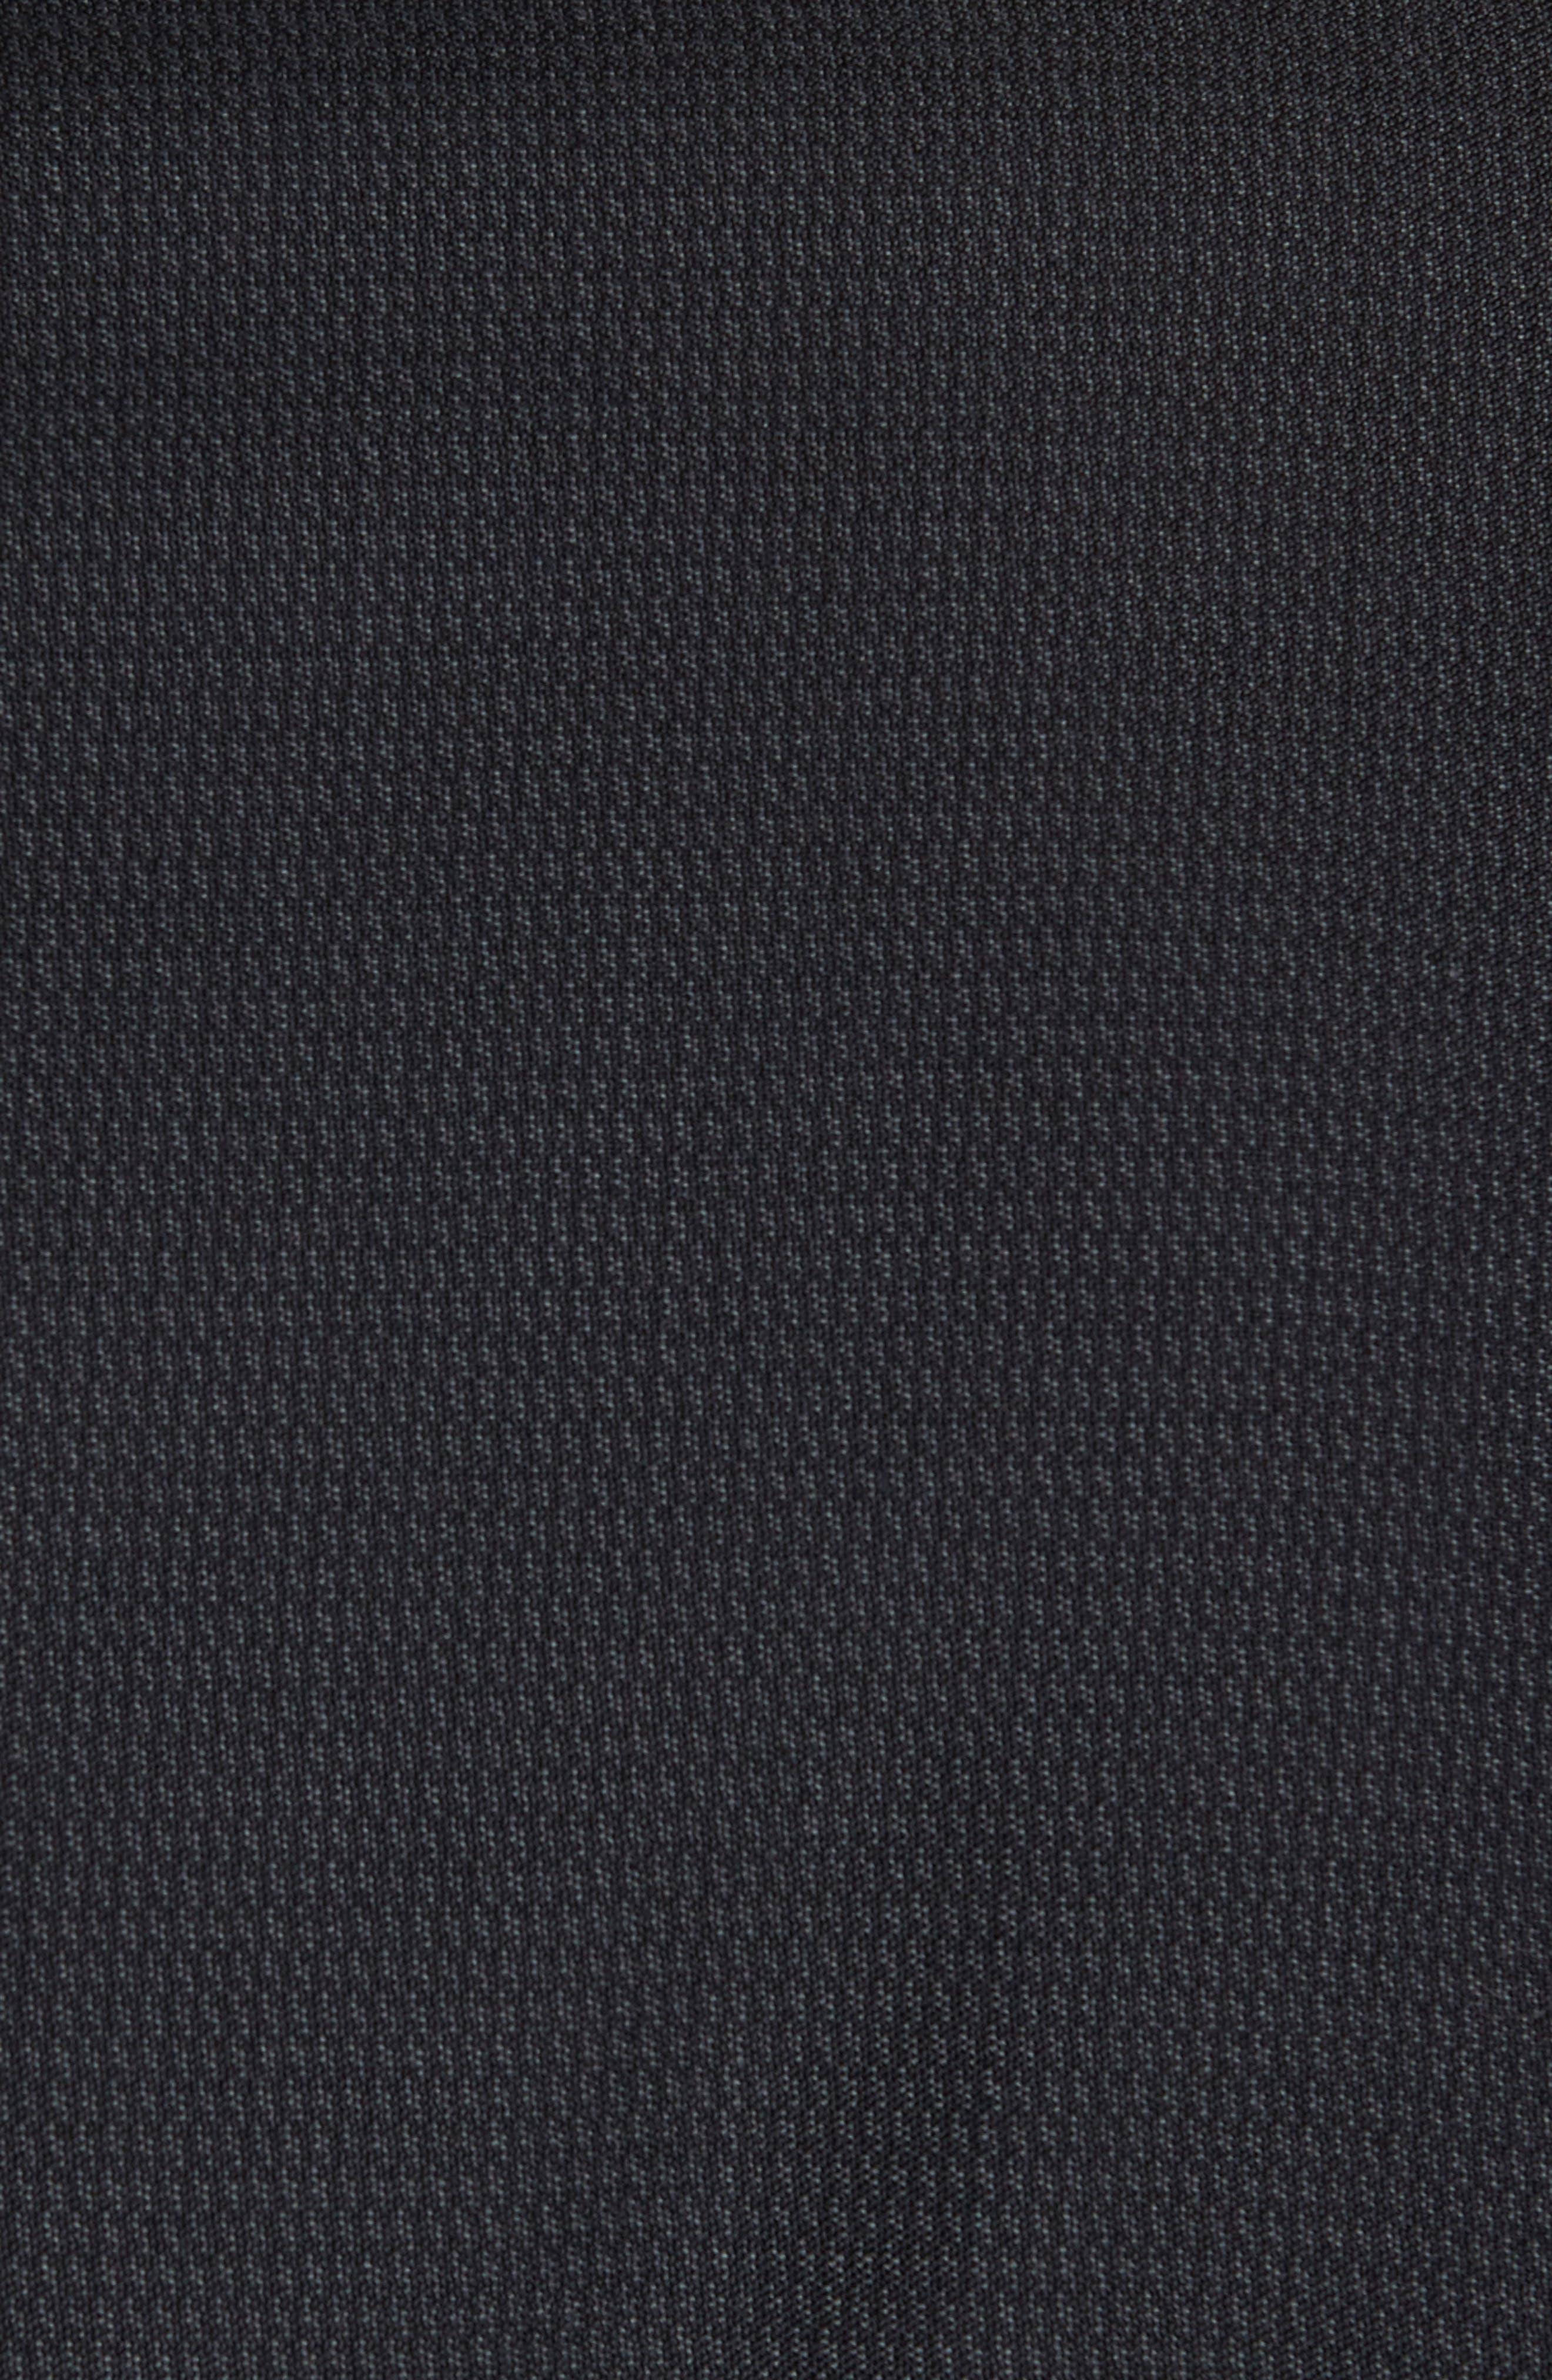 Jay Trim Fit Solid Wool Suit,                             Alternate thumbnail 7, color,                             001